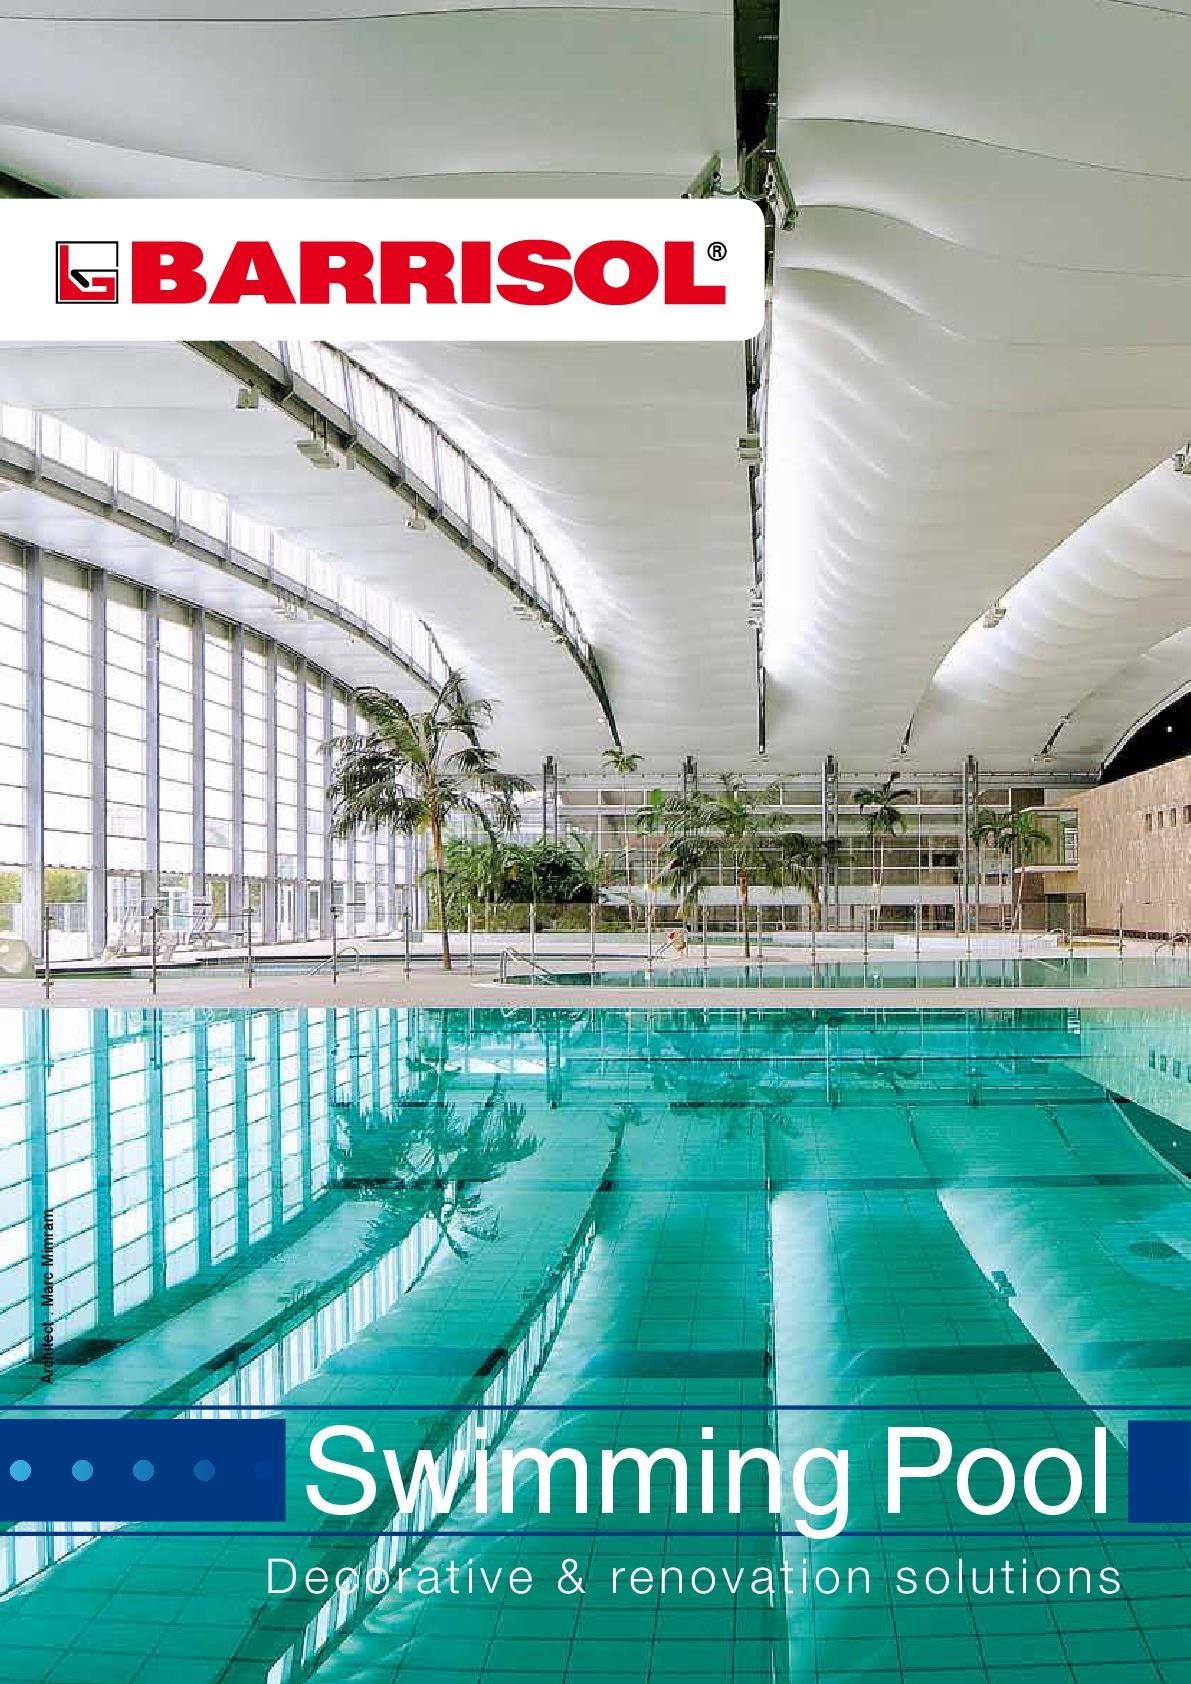 BARRISOL Swimming Pool